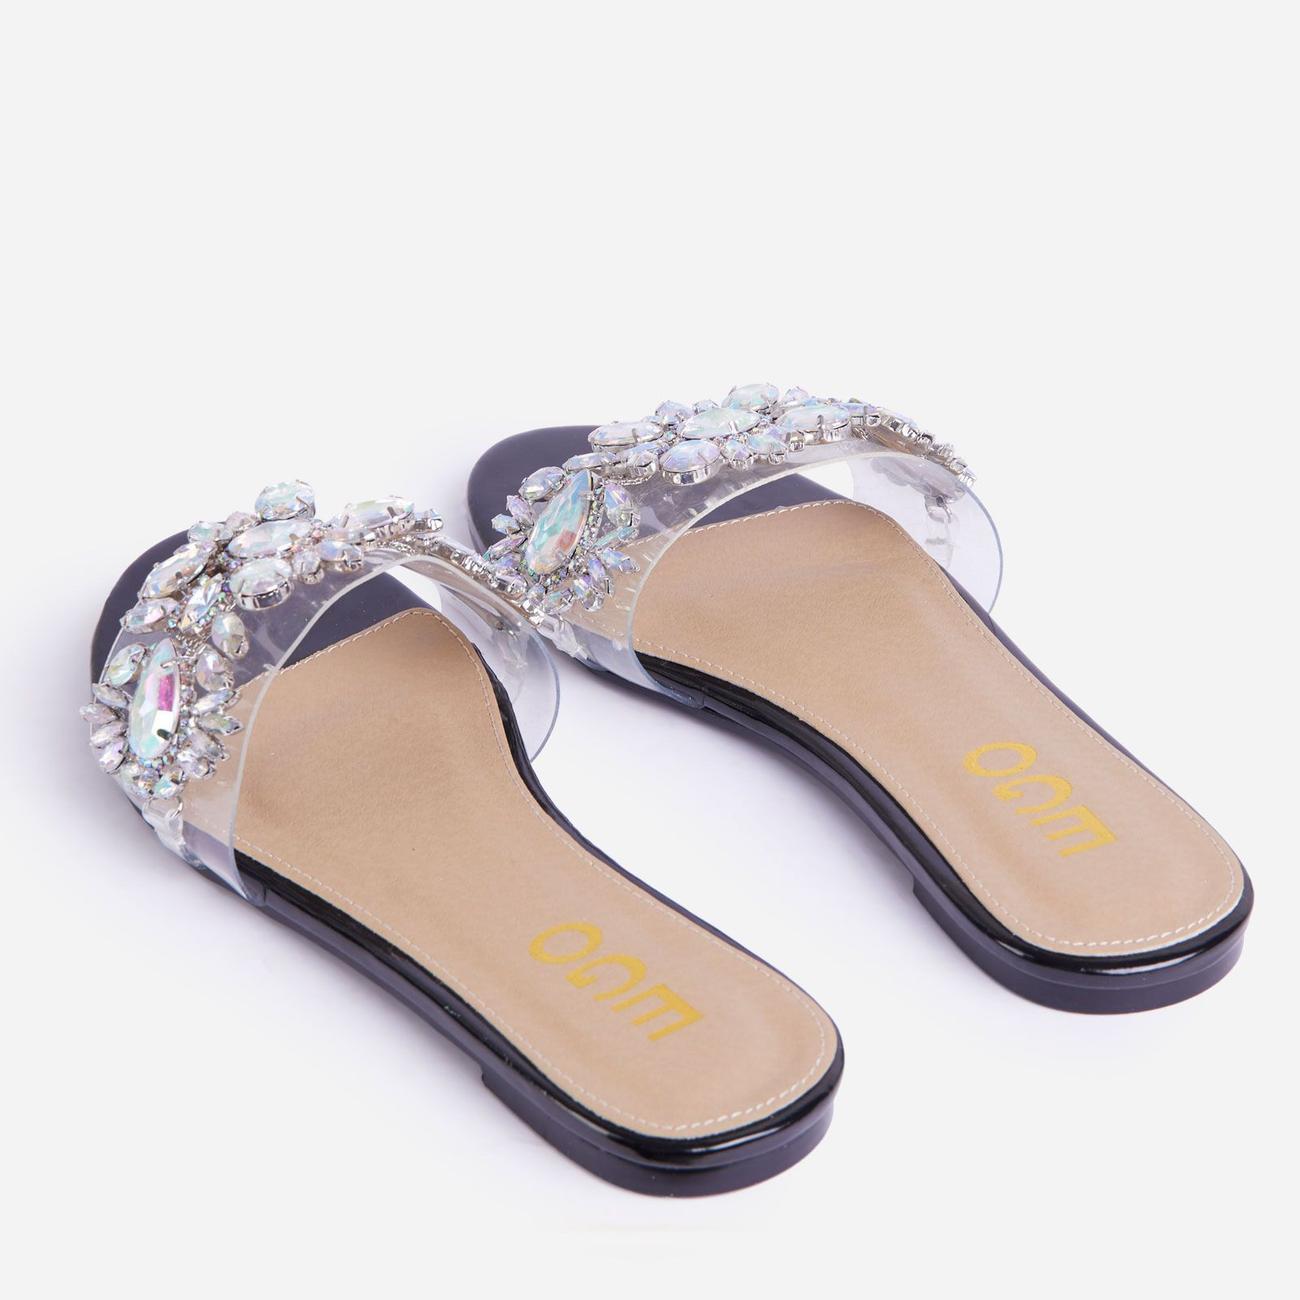 Duchess Diamante Gem Detail Perspex Flat Slider Sandal In Black Patent Image 3